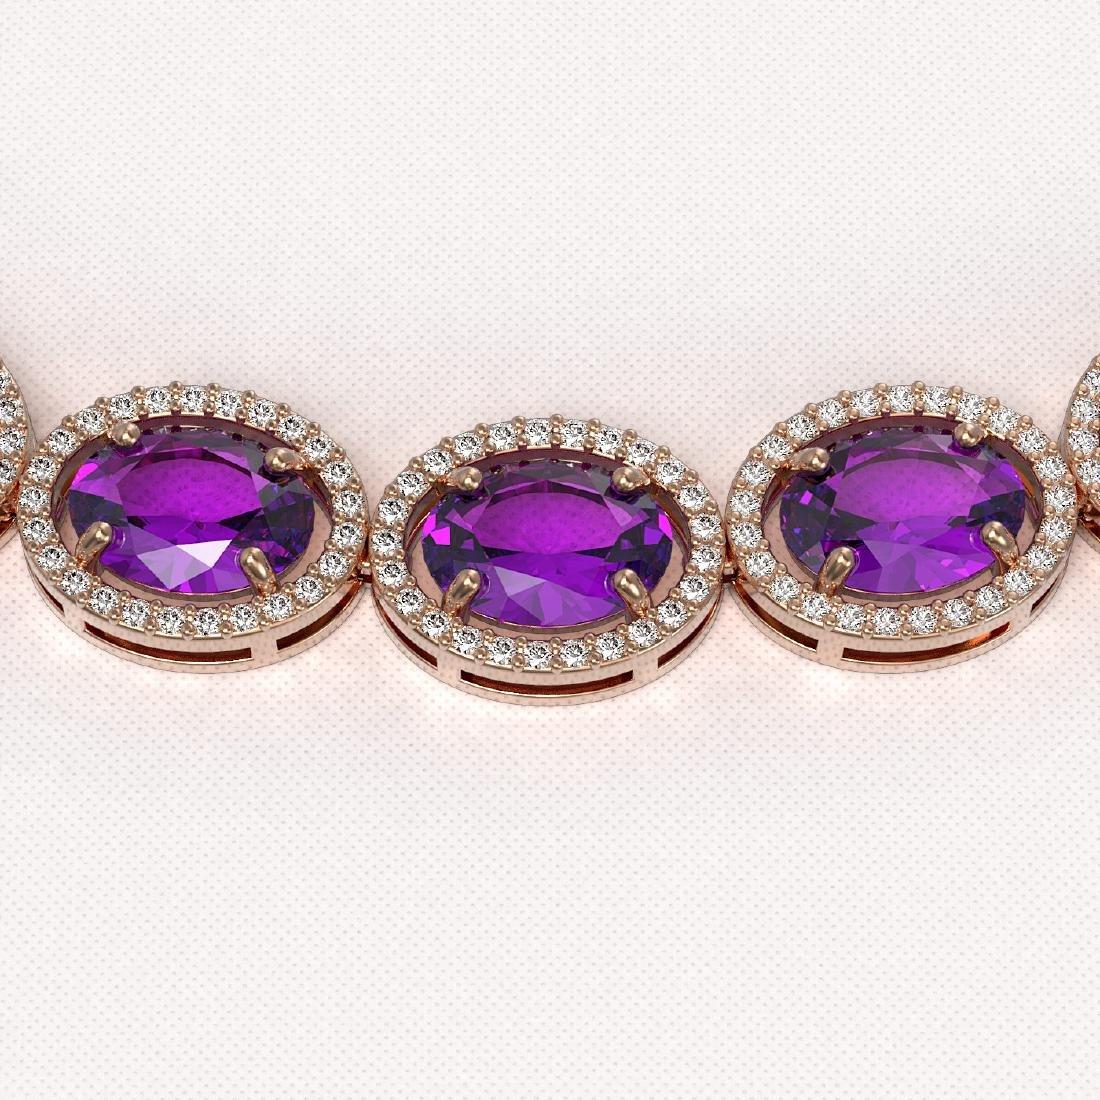 57.07 CTW Amethyst & Diamond Halo Necklace 10K Rose - 3